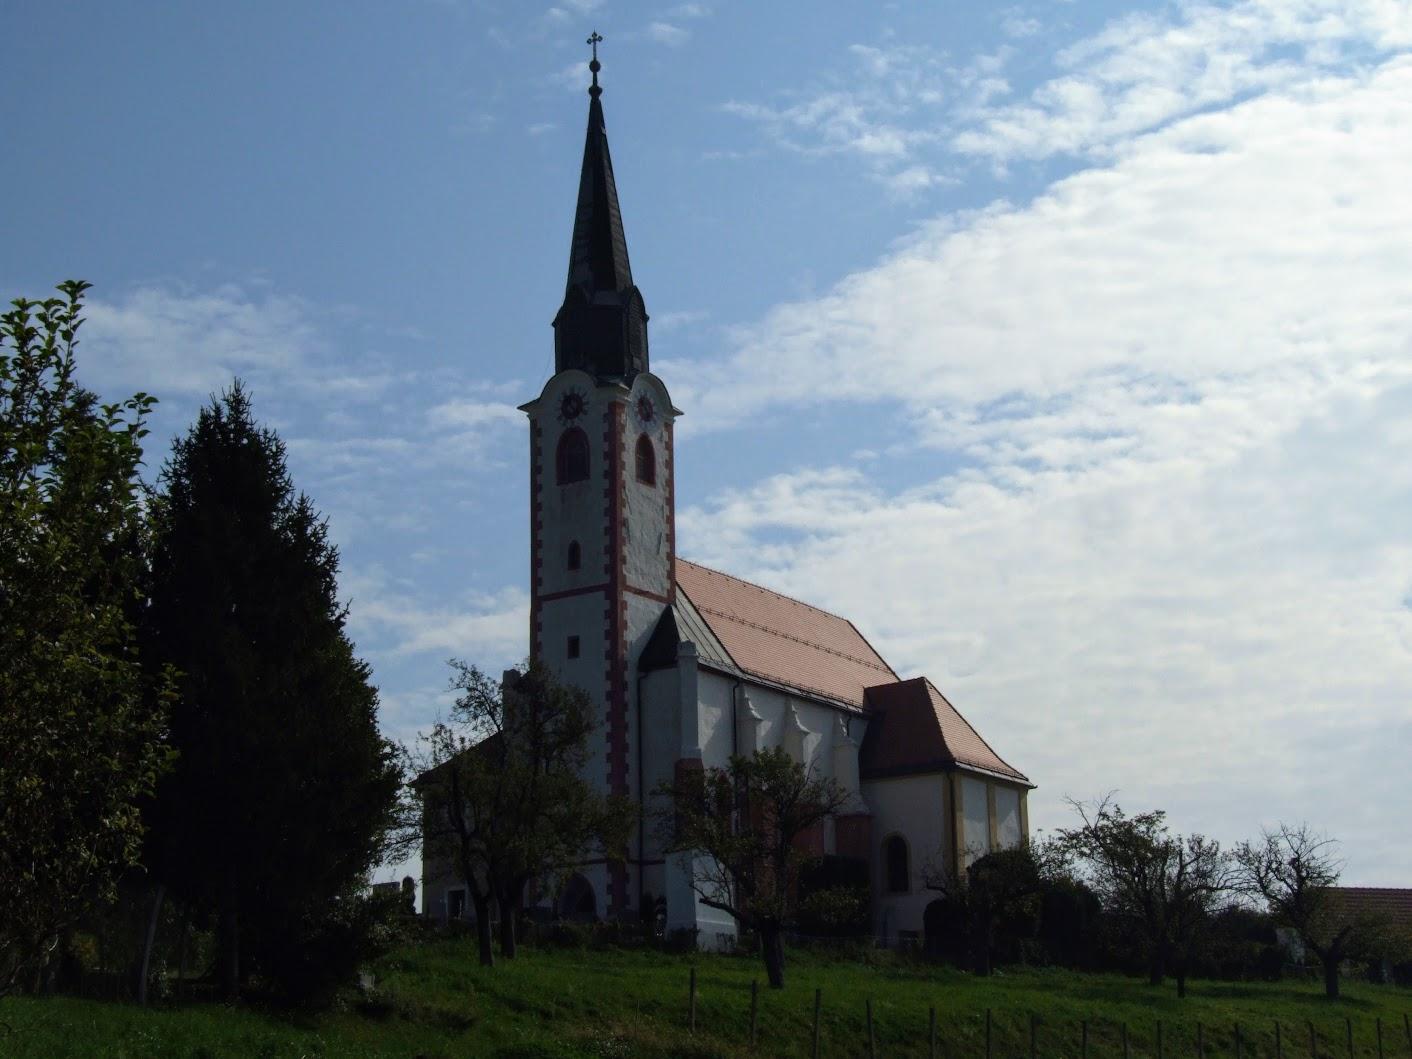 Maribor, Malečnik - Cerkev sv. Marije na Gorci (Szűz Mária templom a Gorca-dombon, 349 m)